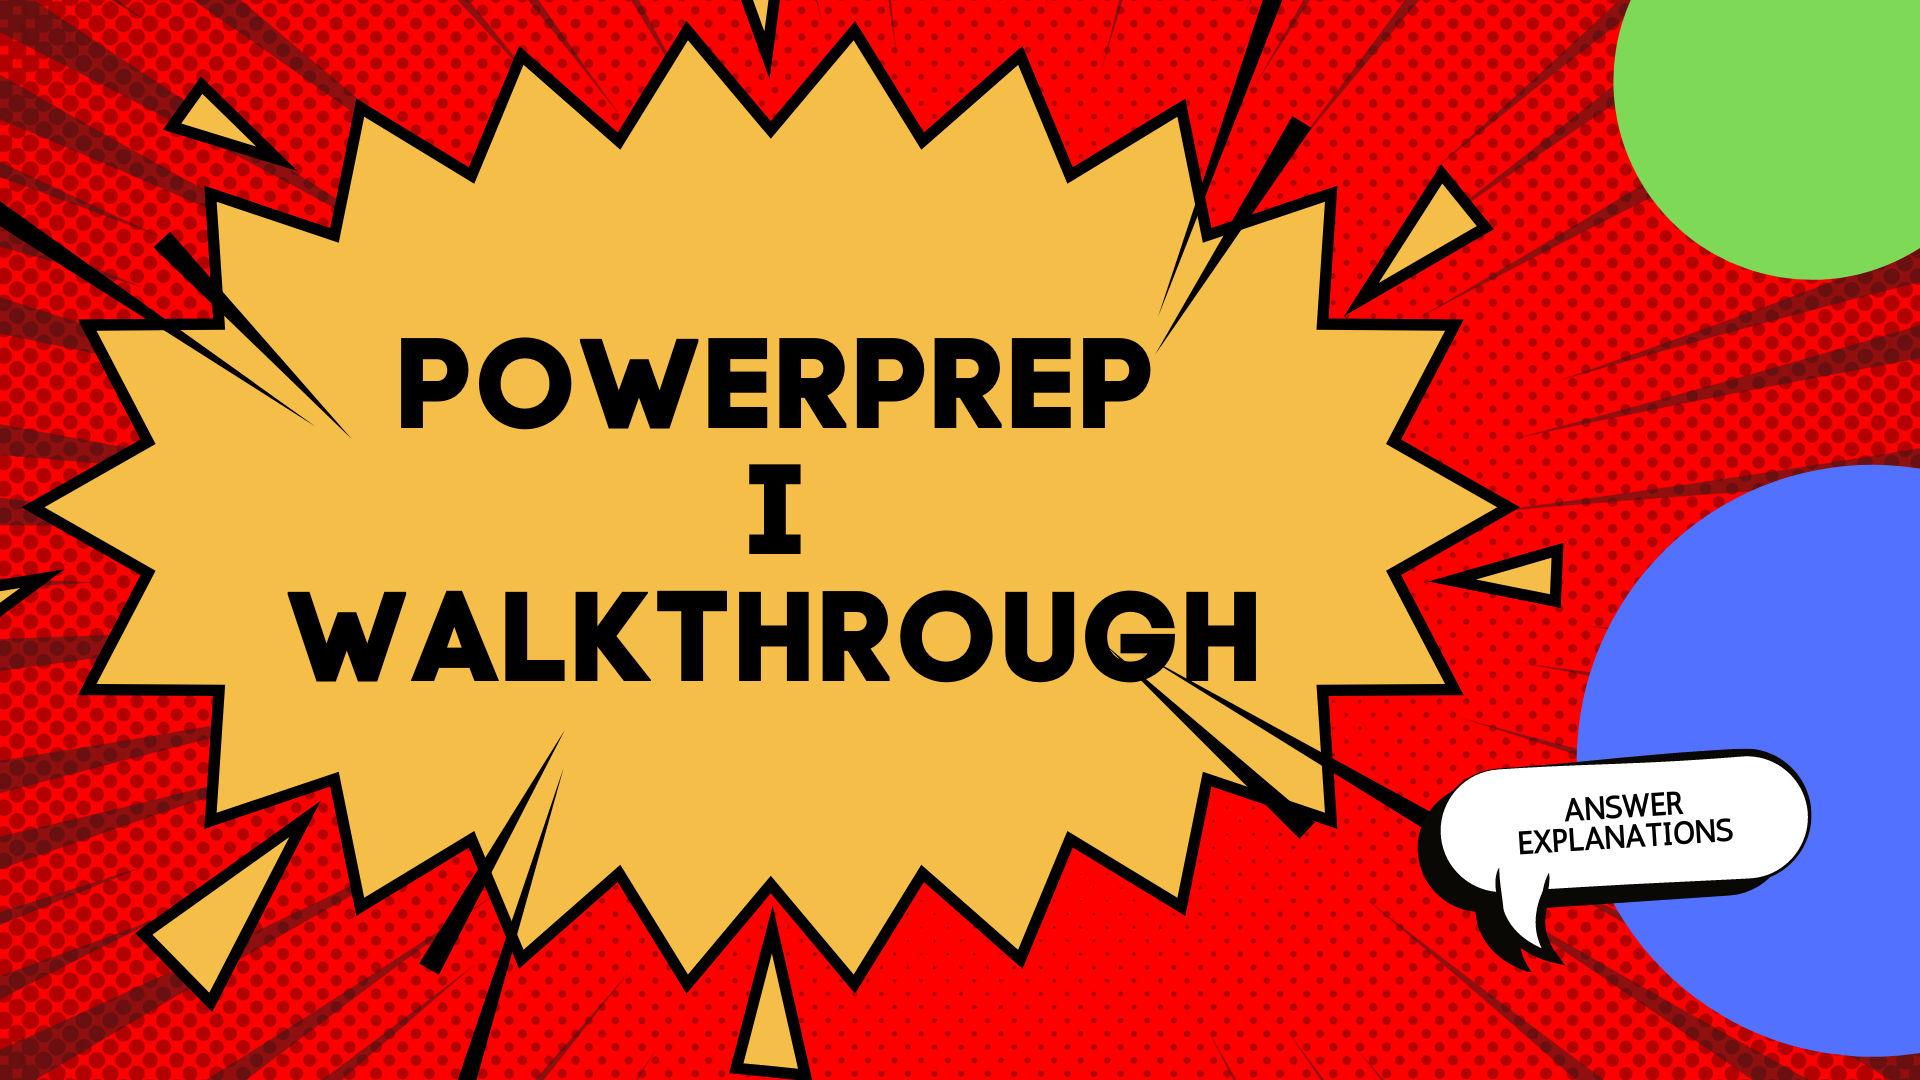 PowerPrep 1